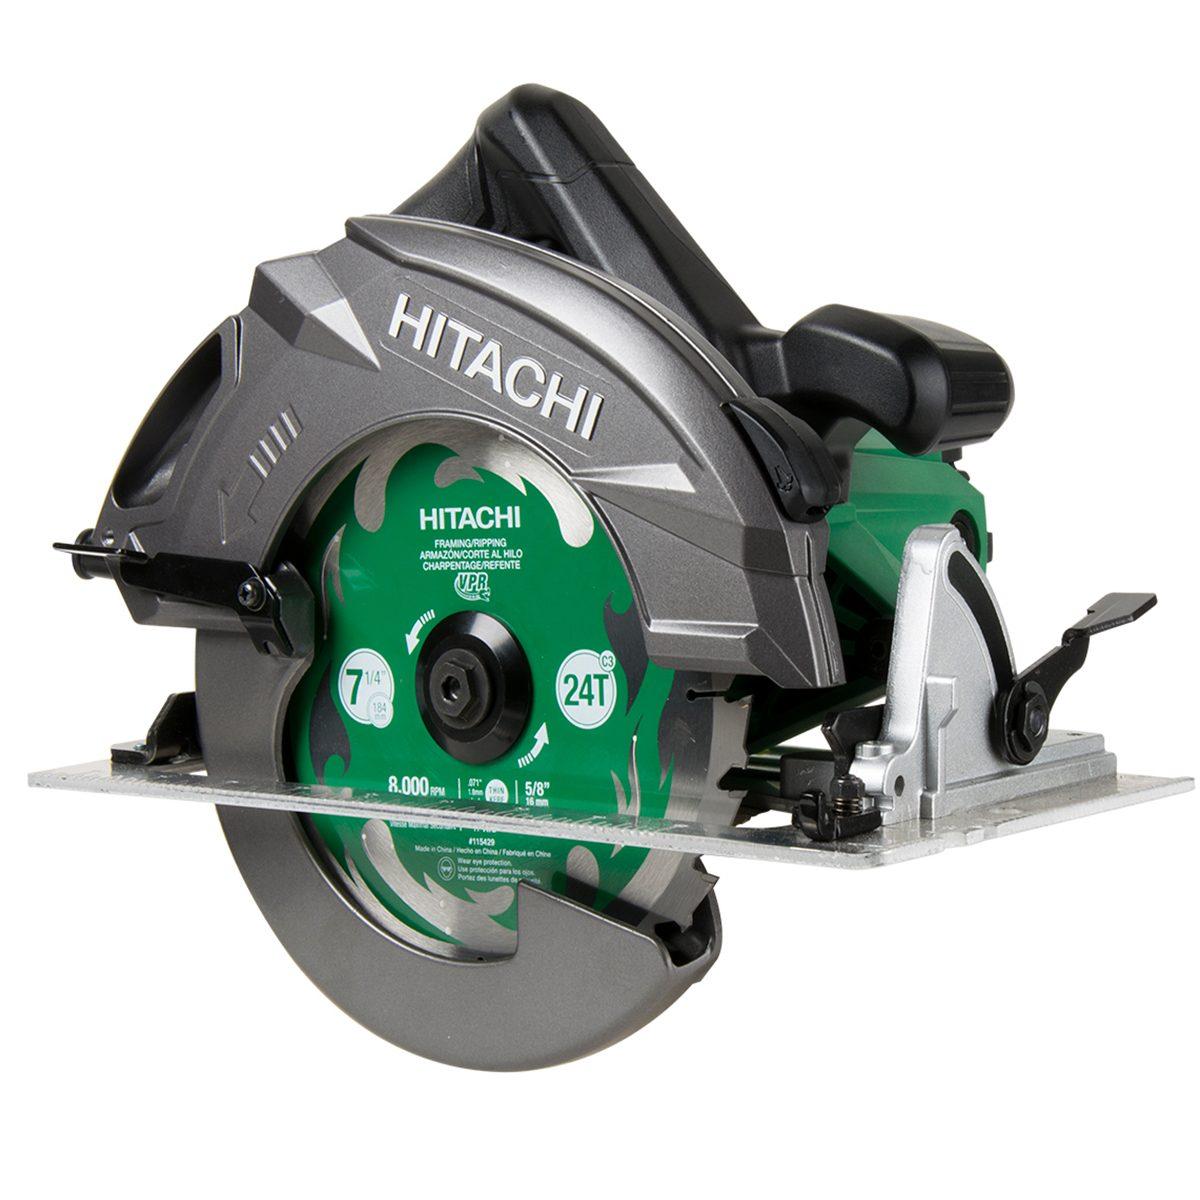 Green and Grey Hitachi Circular Saw   Construction Pro Tips